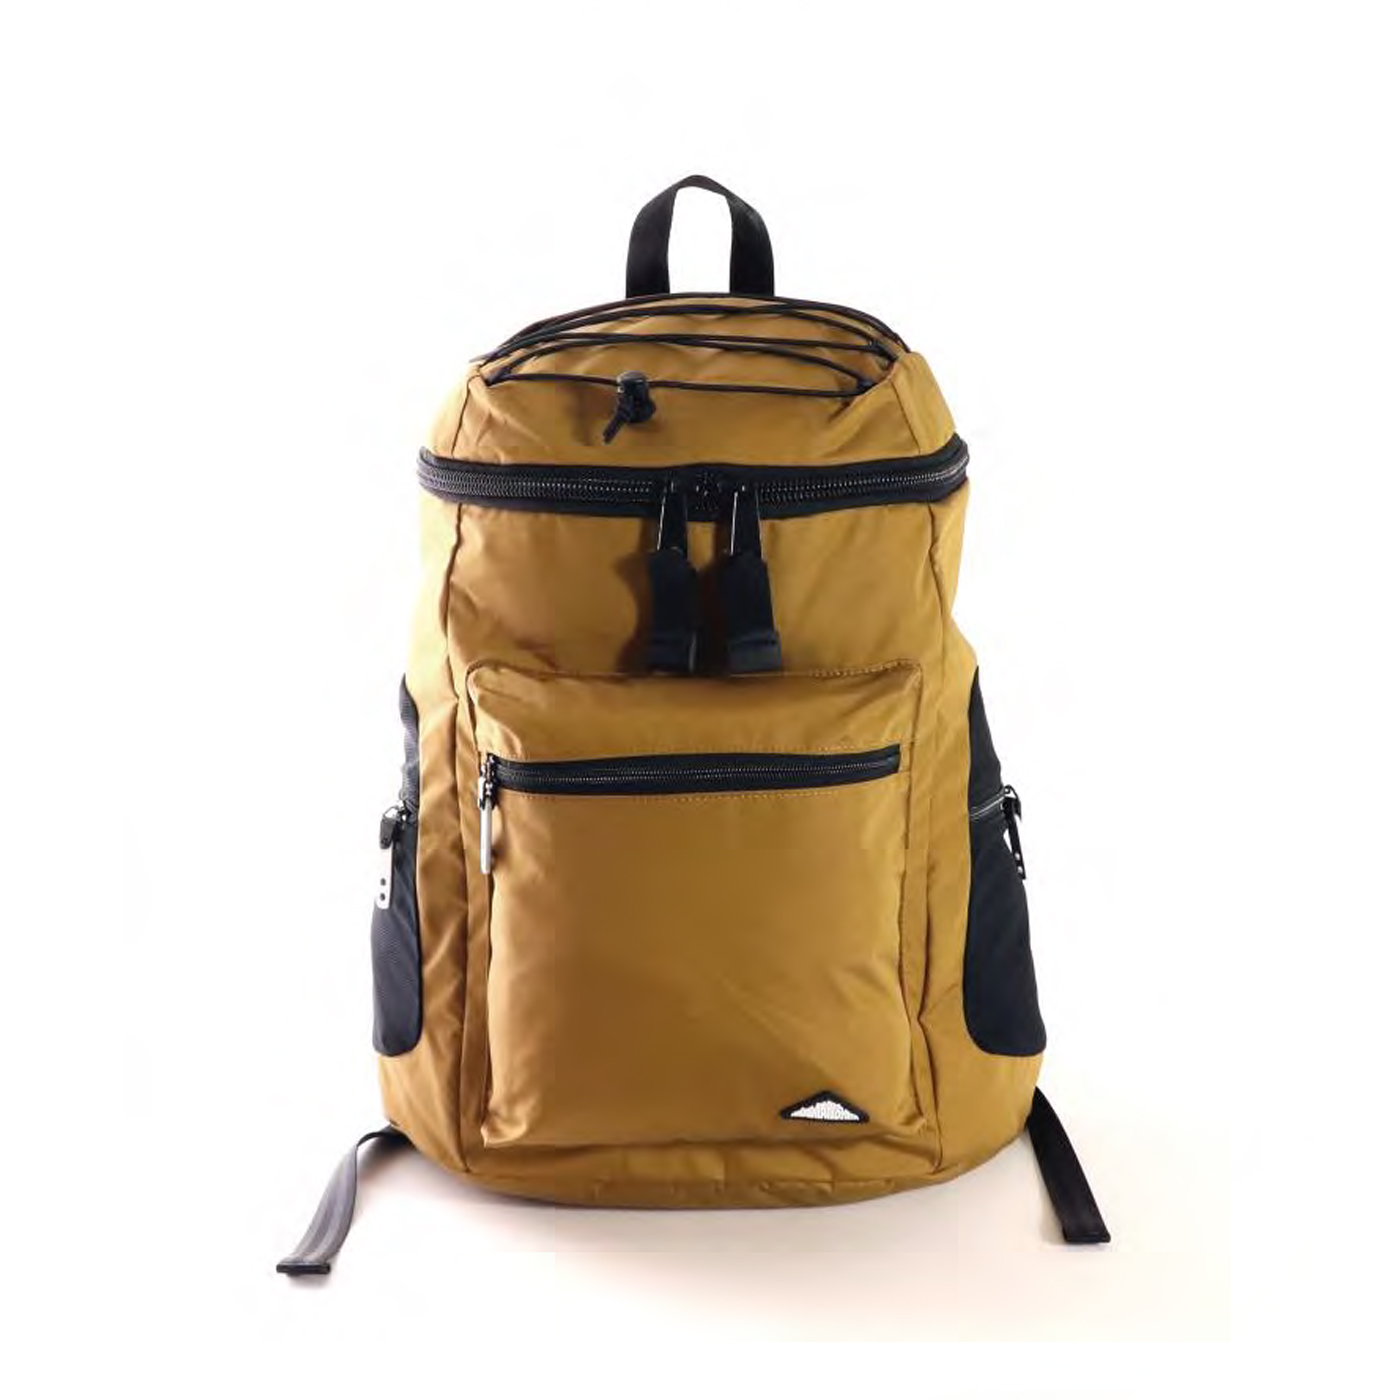 product: GOLDEN / color: BEIGE 1